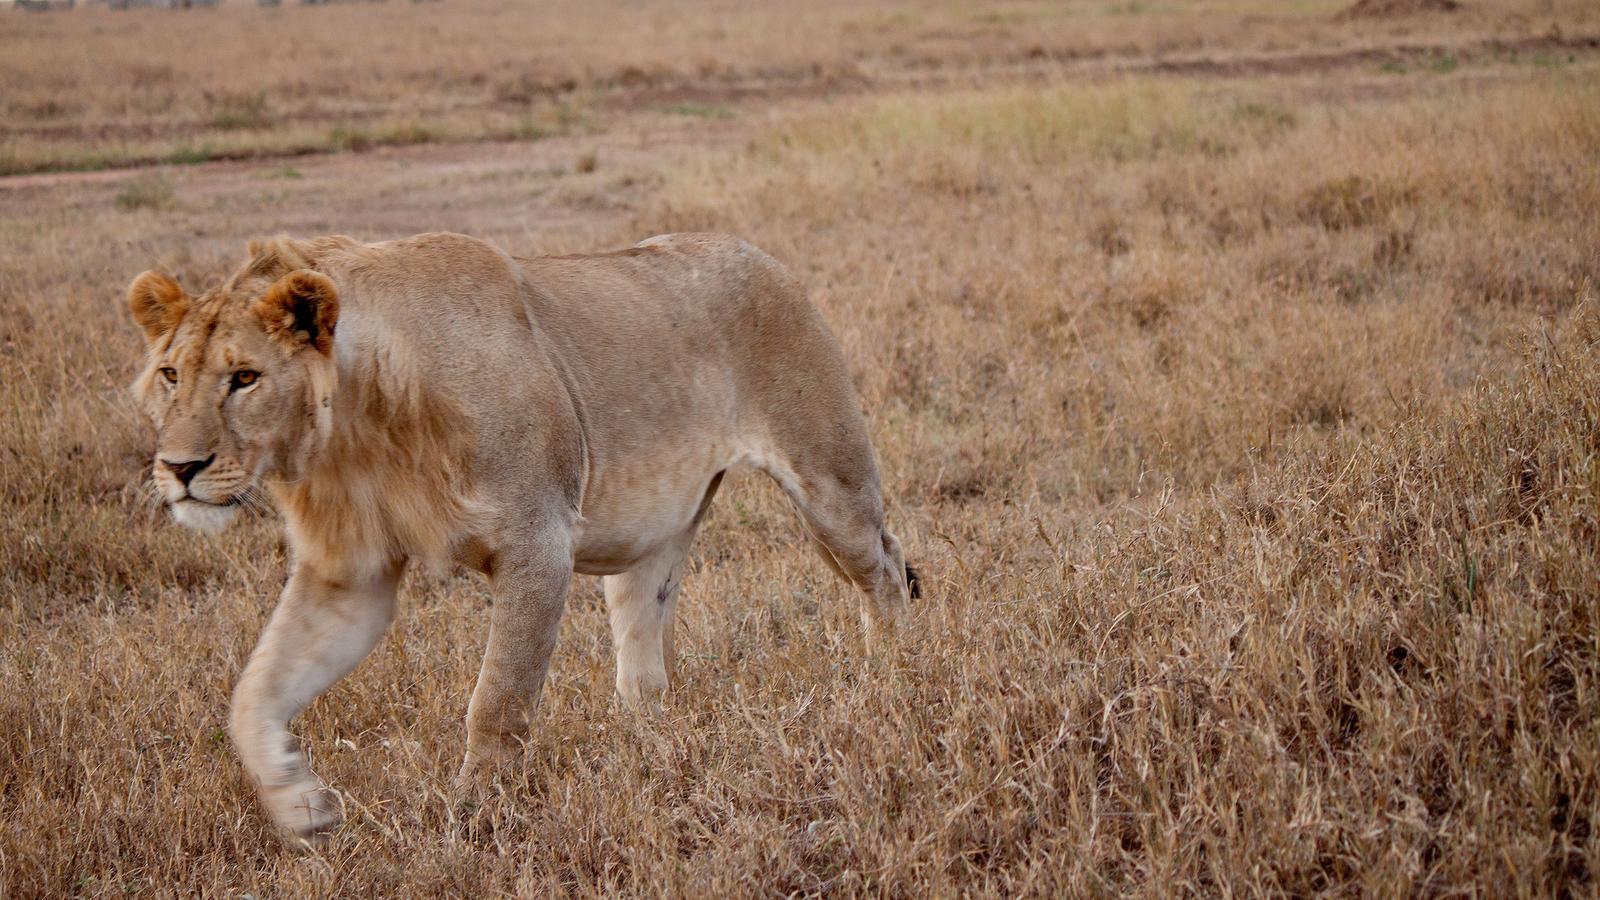 Serengeti to Victoria Falls Overland: Night Stars & Spices